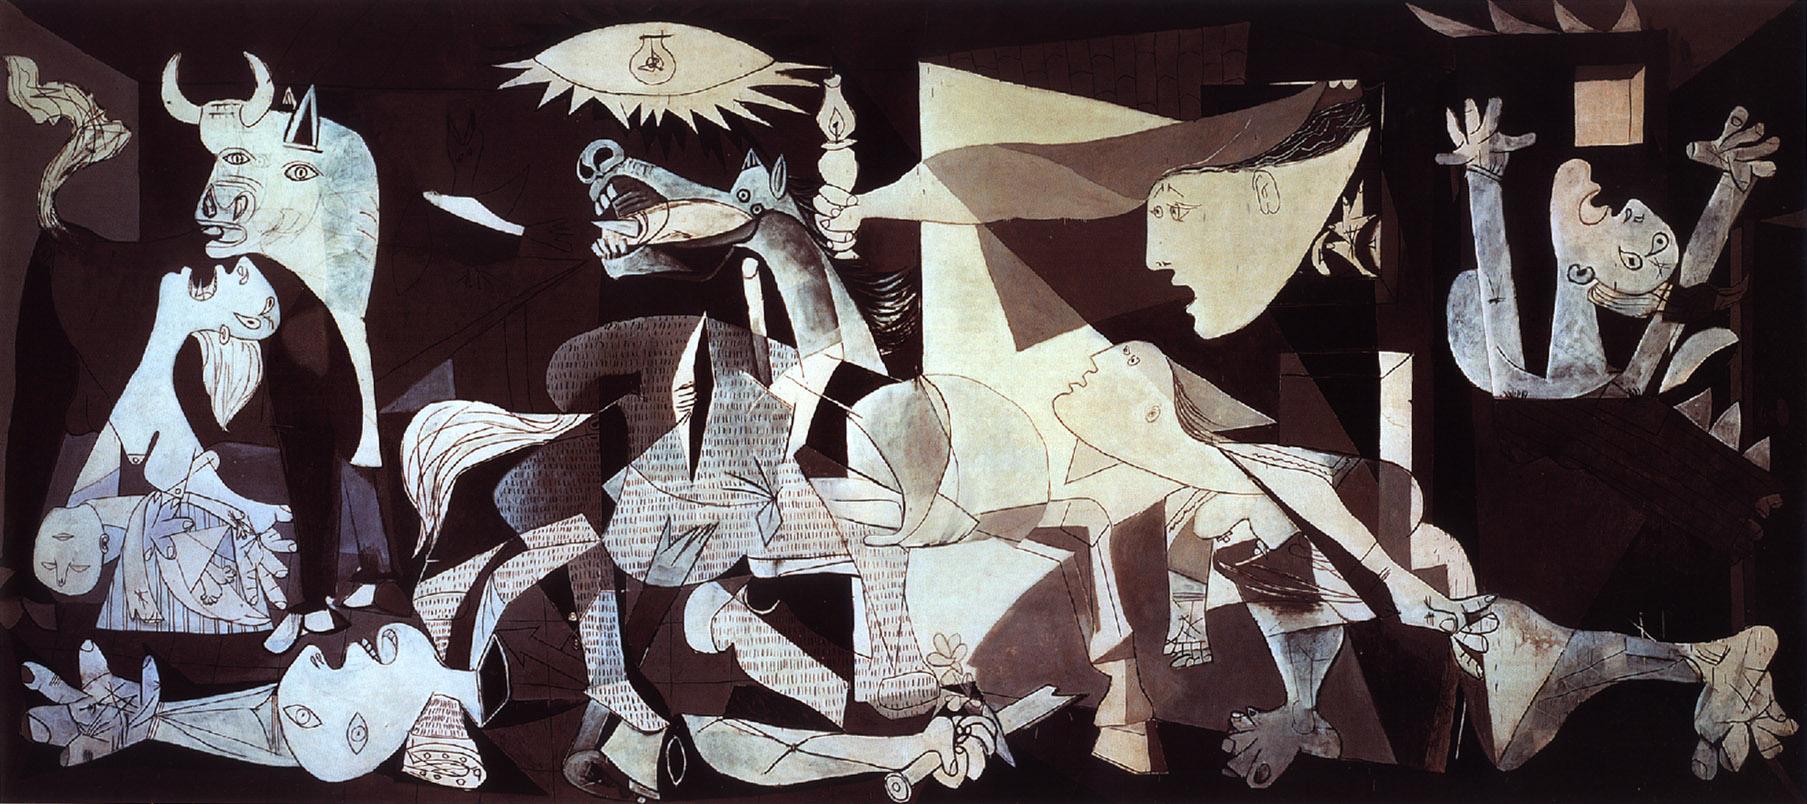 Klimt Wallpaper Iphone Guernica Wallpaper Art Painting Wall Art Pablo Picasso